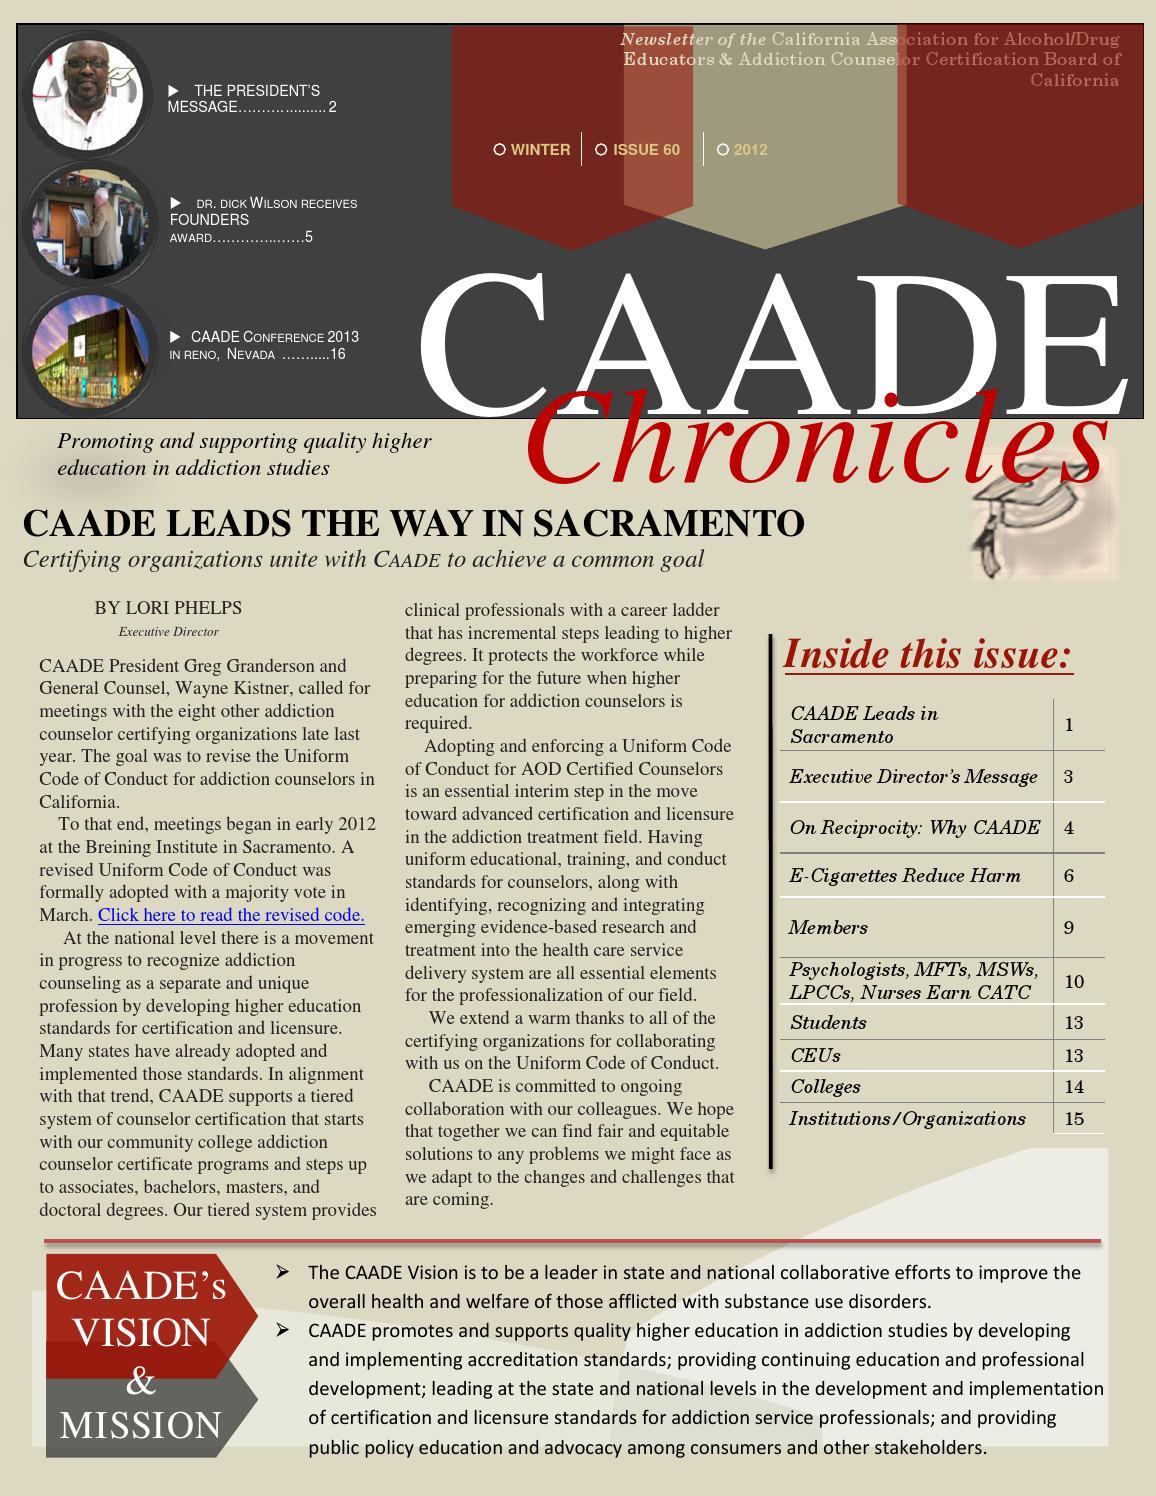 Caade Chronicles Winter 2012 By Caade Catc Issuu